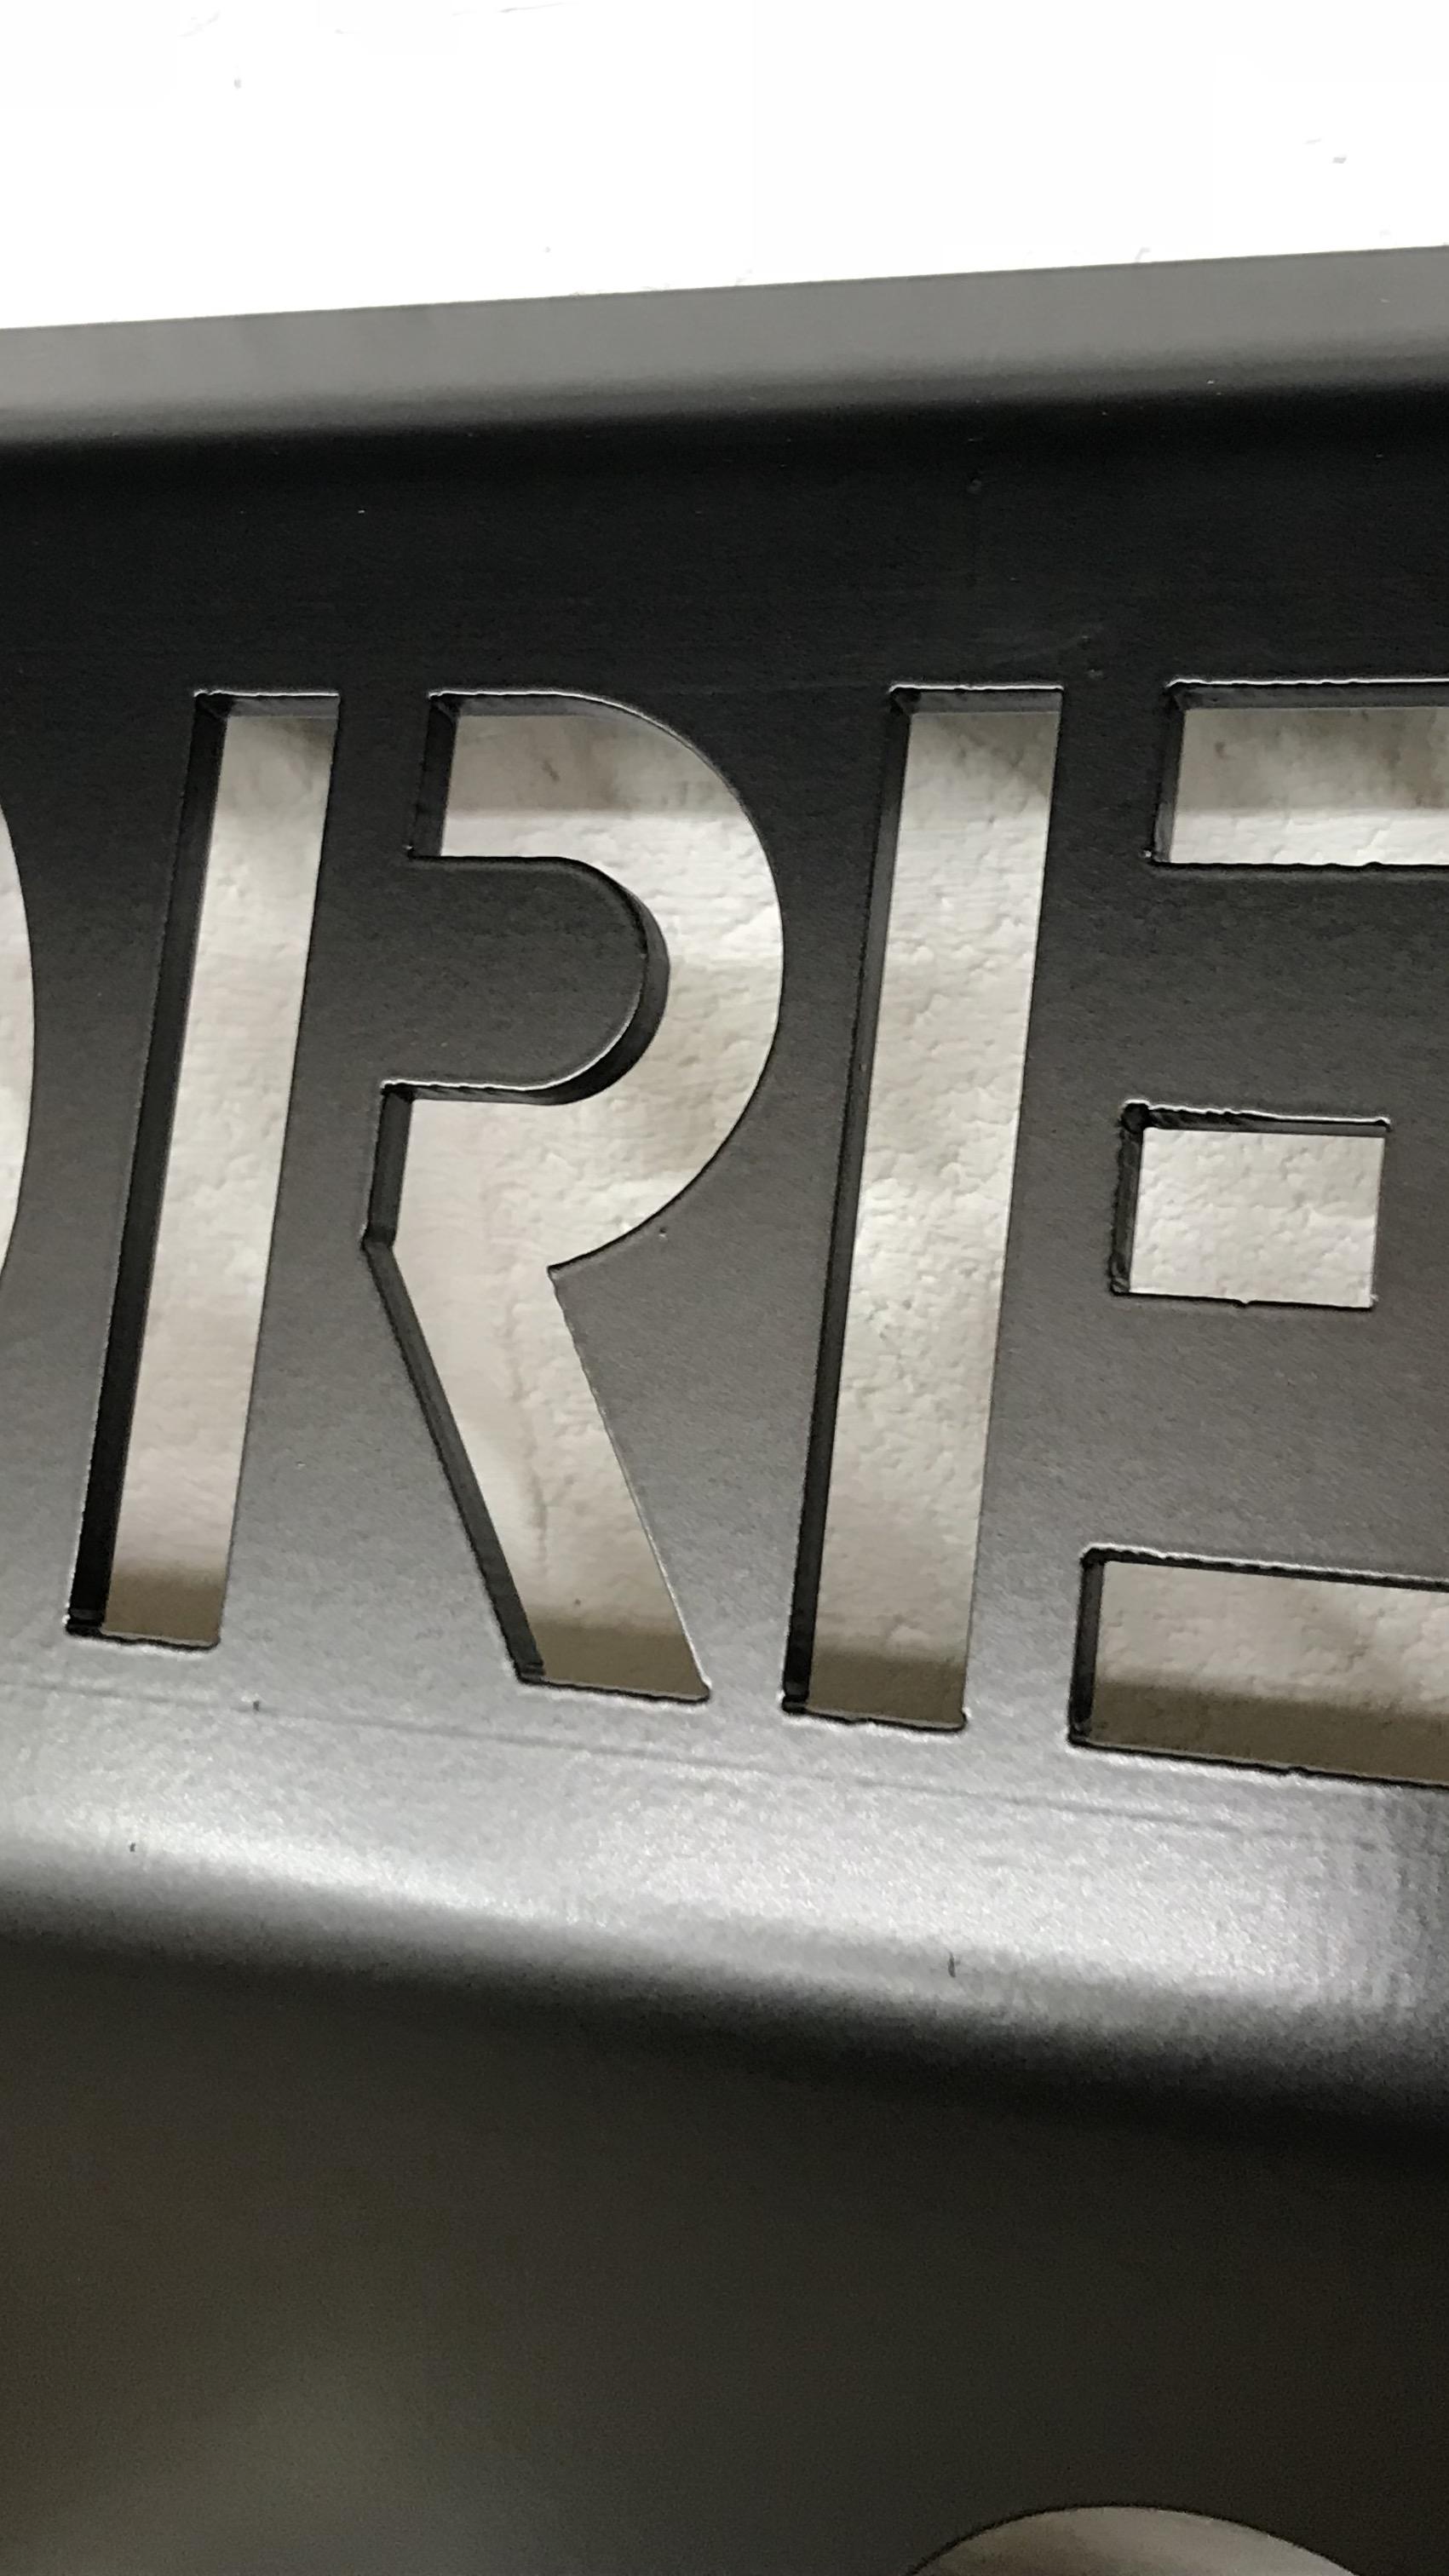 ORE, OakRidge engineering, steering guard, ore4x4, ore4x4uk, land rover defender, defender accessori